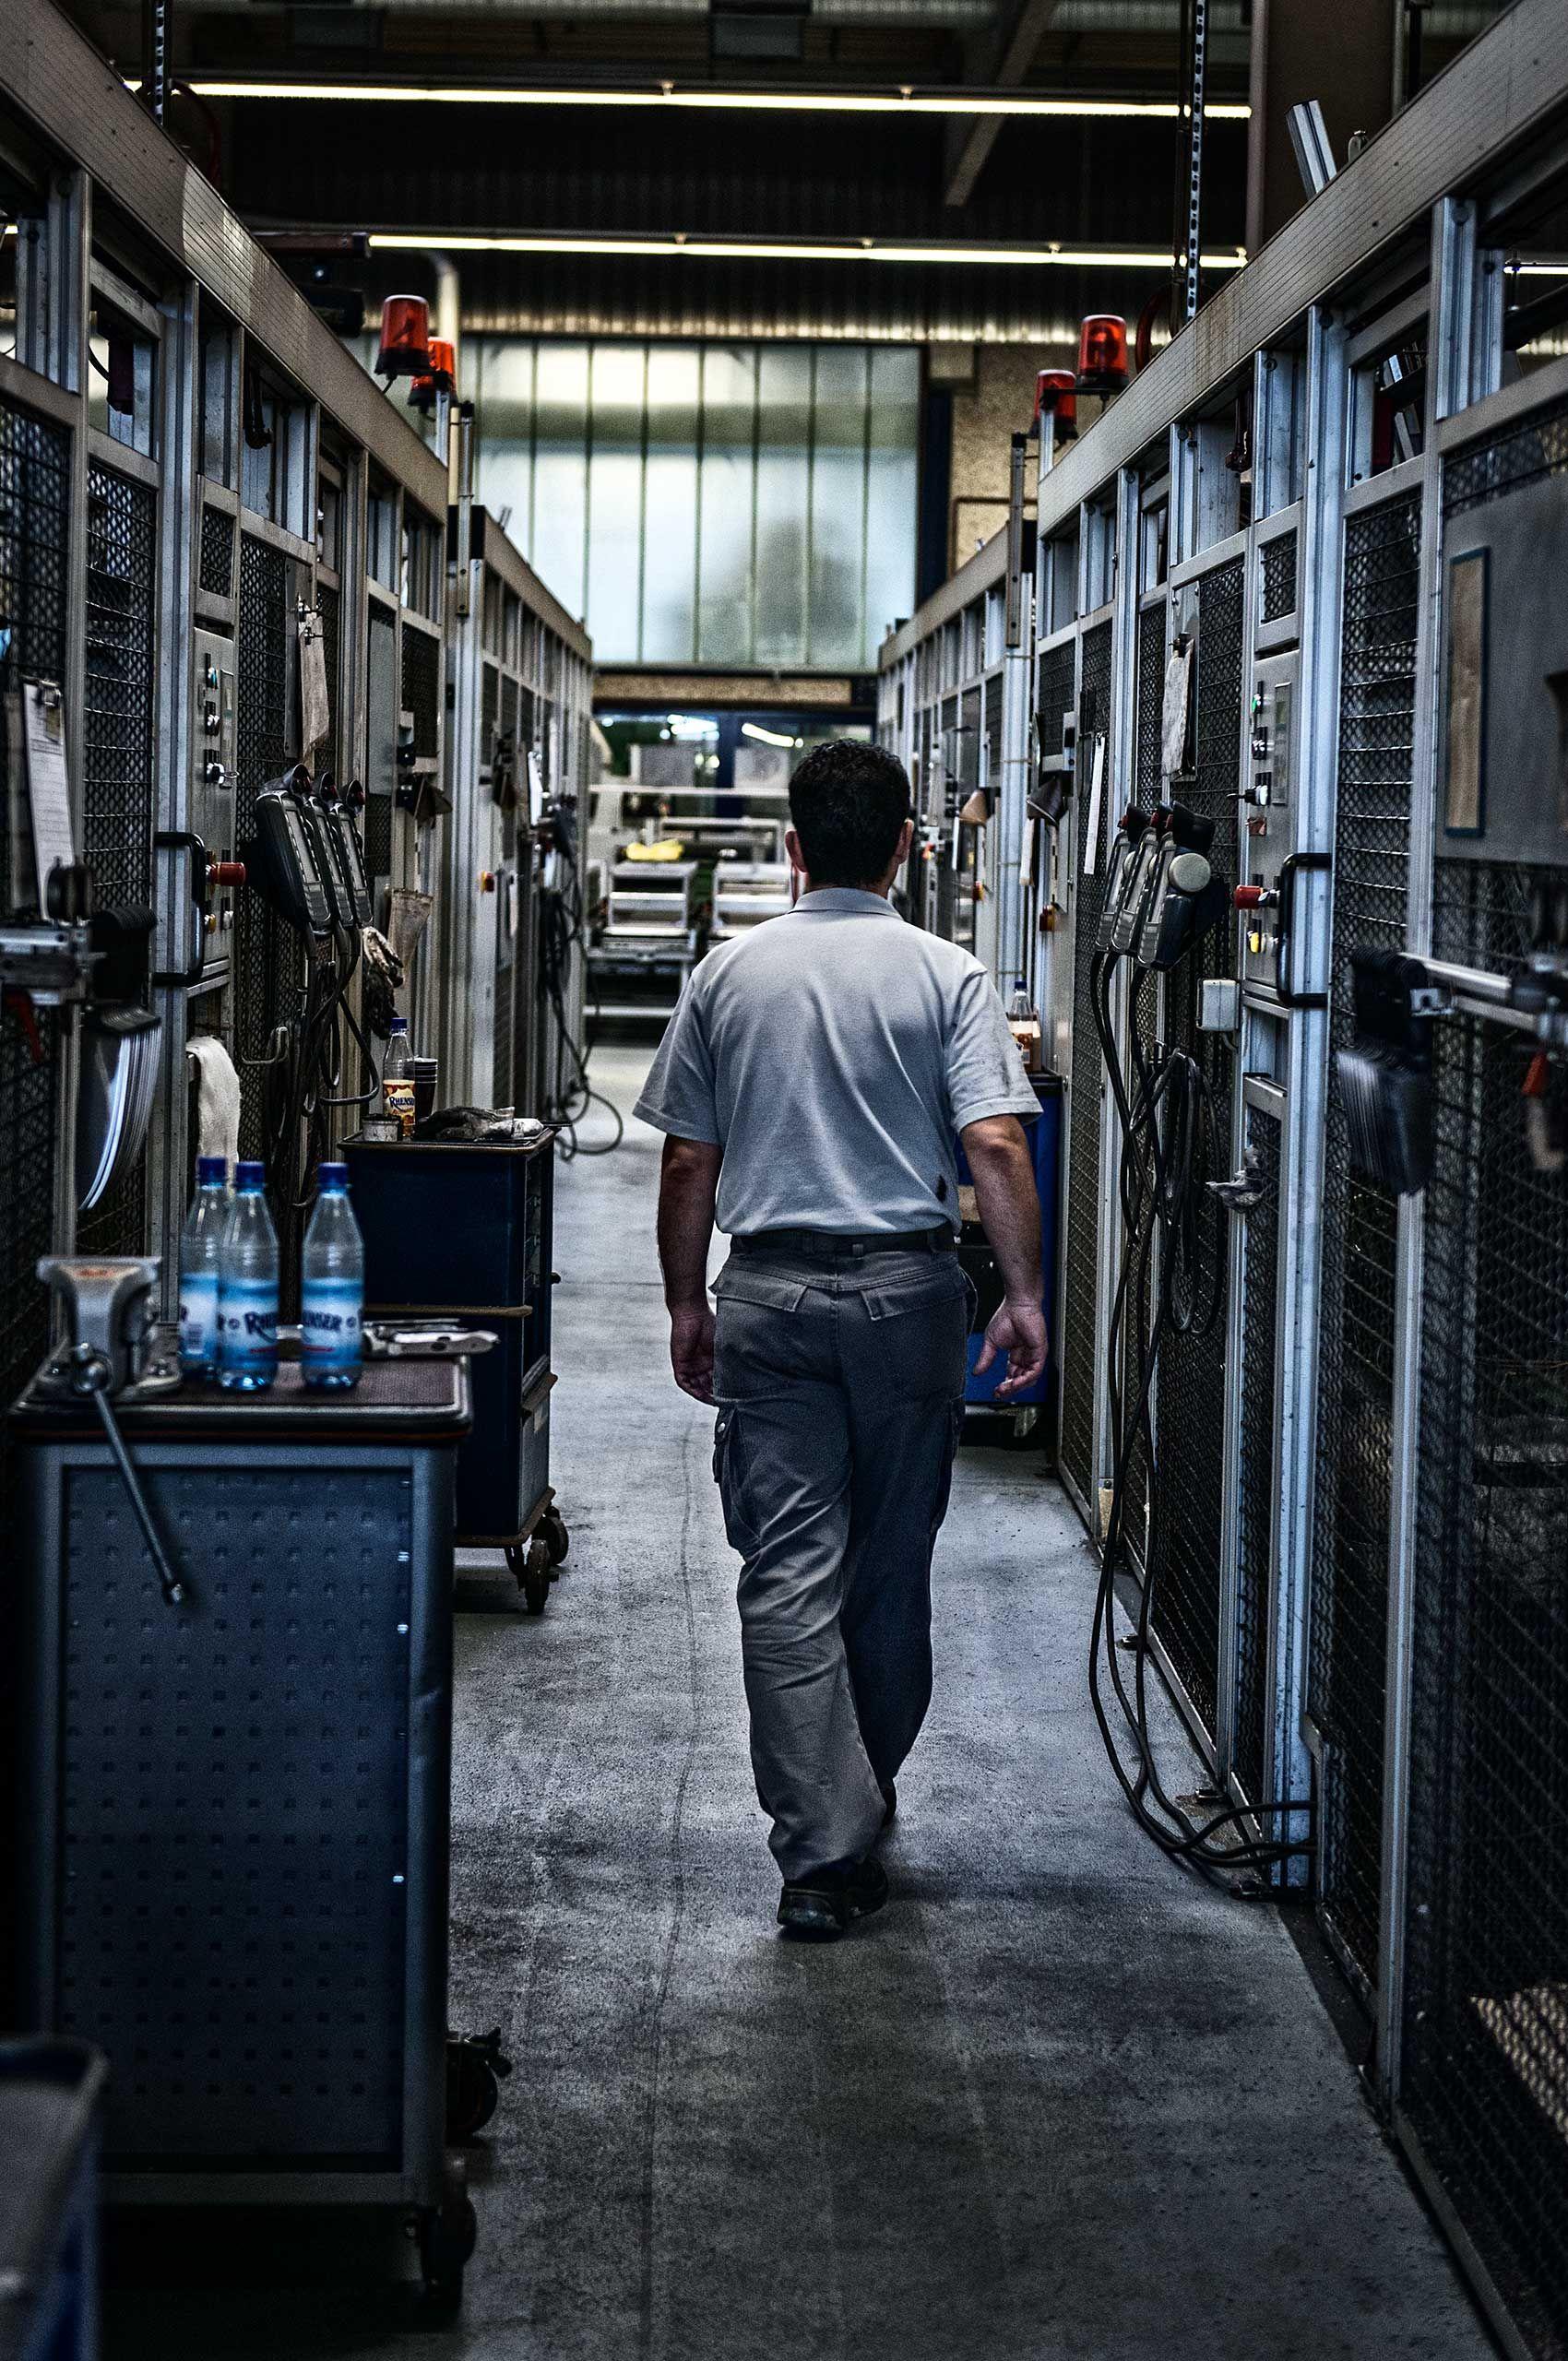 walking-away-wusthof-factory-HenrikOlundPhotography.jpg